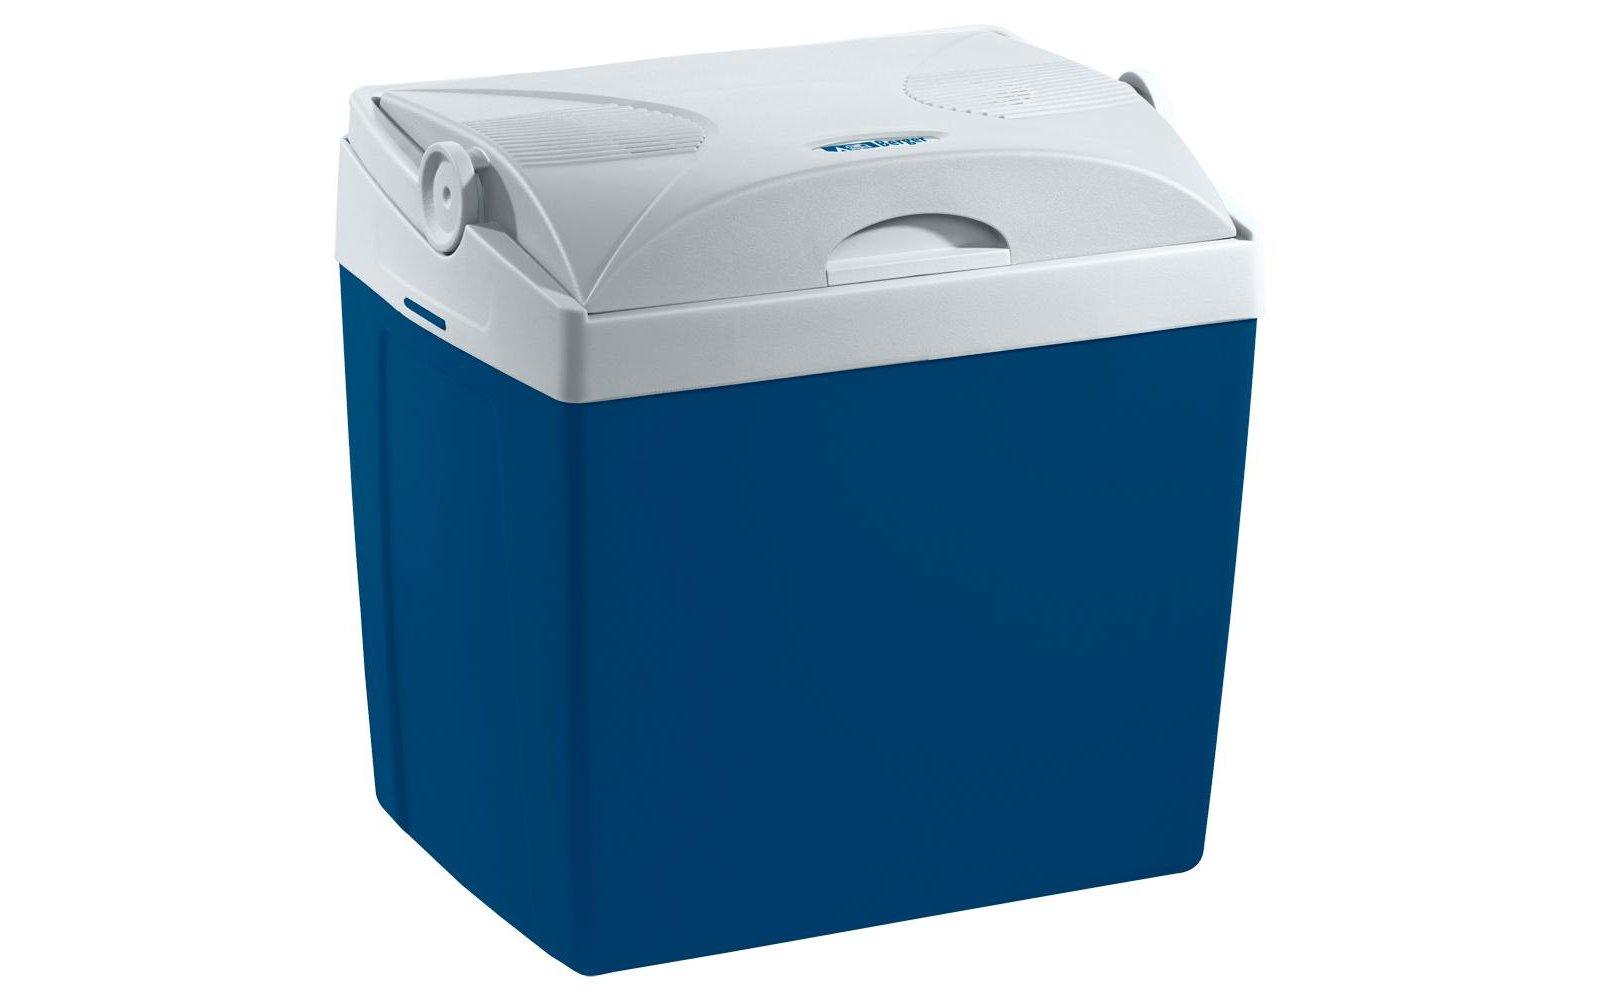 berger elektrok hlbox 26 liter fritz berger campingbedarf. Black Bedroom Furniture Sets. Home Design Ideas